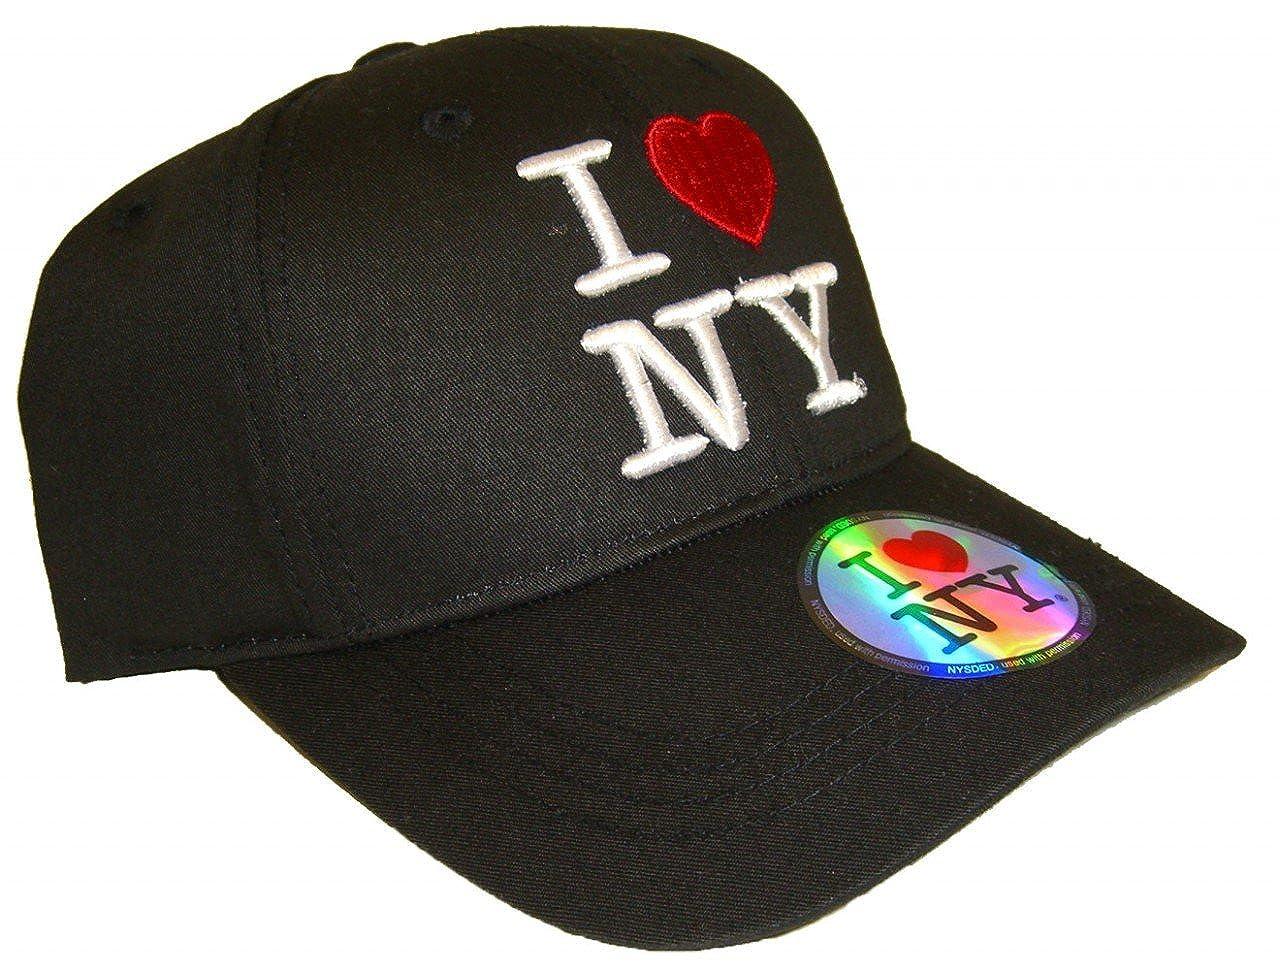 b0590560a Amazon.com: I Love NY Cap - Color: Black: Clothing